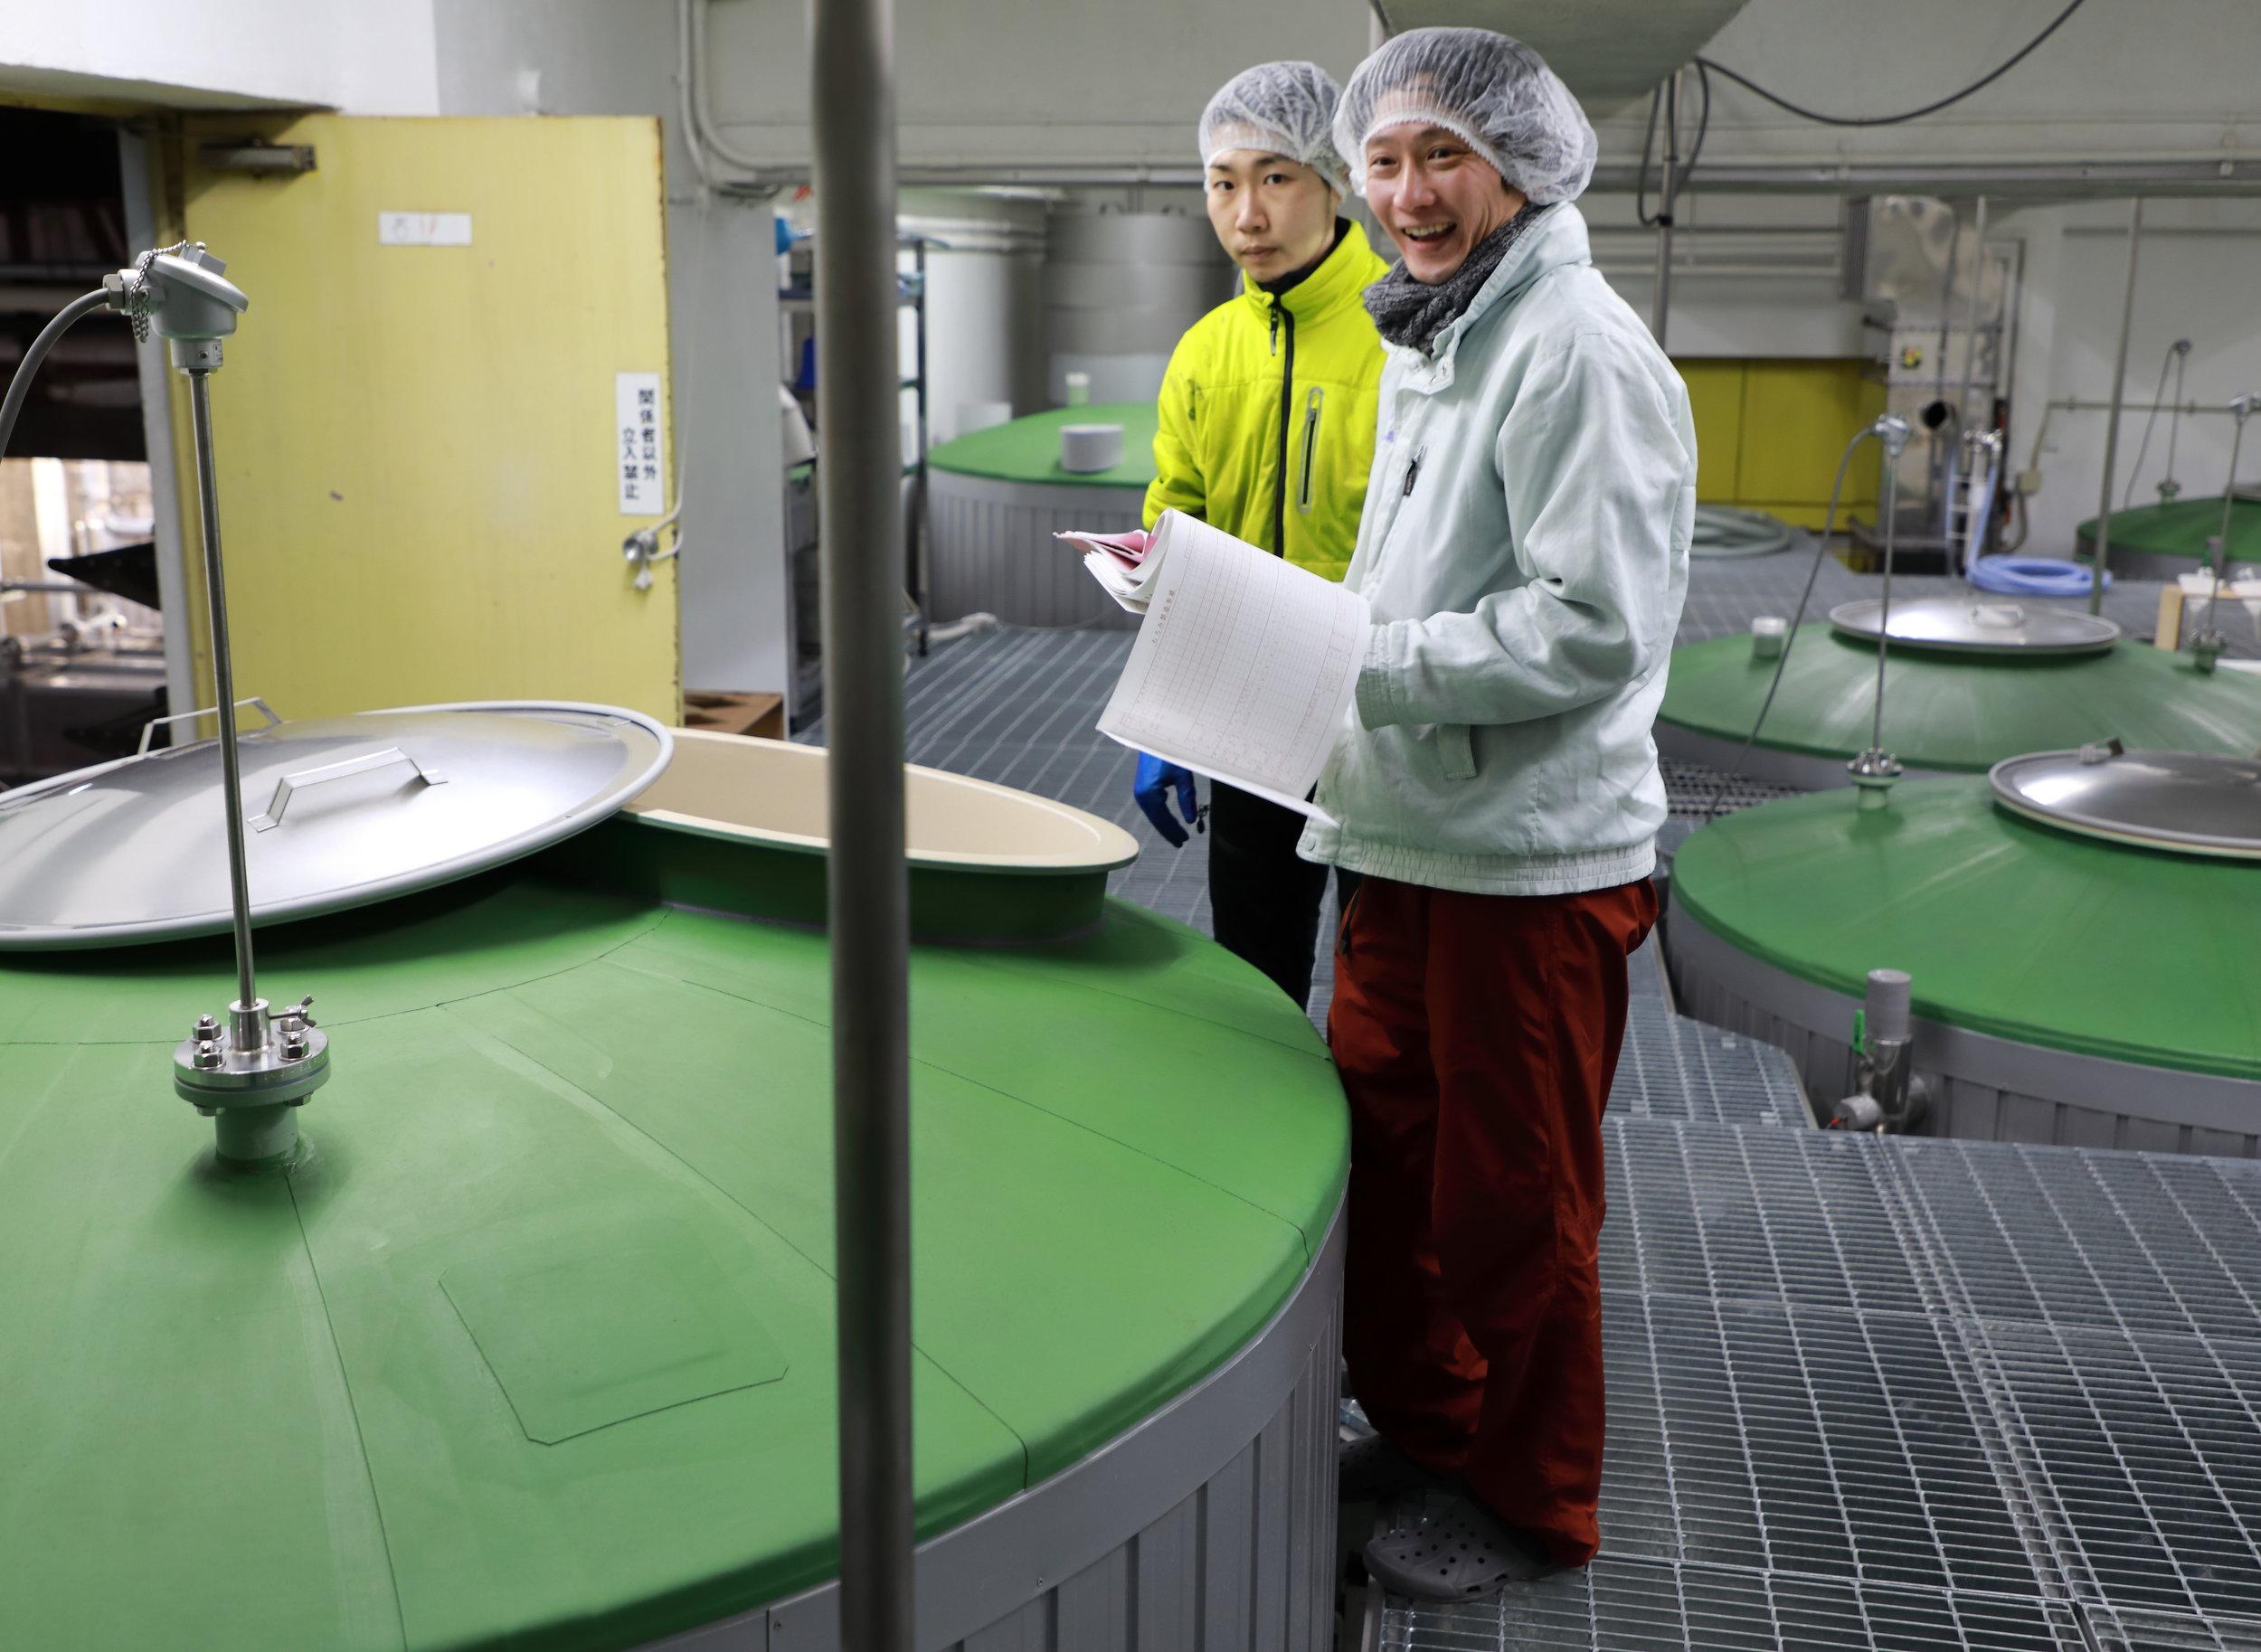 Kazuma Matsuzawa, standing on the right in the main fermentation room, is Yucho Shuzo's  toji , or chief brewer. Like Yoshi, Kazuma is 35 years old and was trained by Yoshi's father, Chobei Yamamoto.